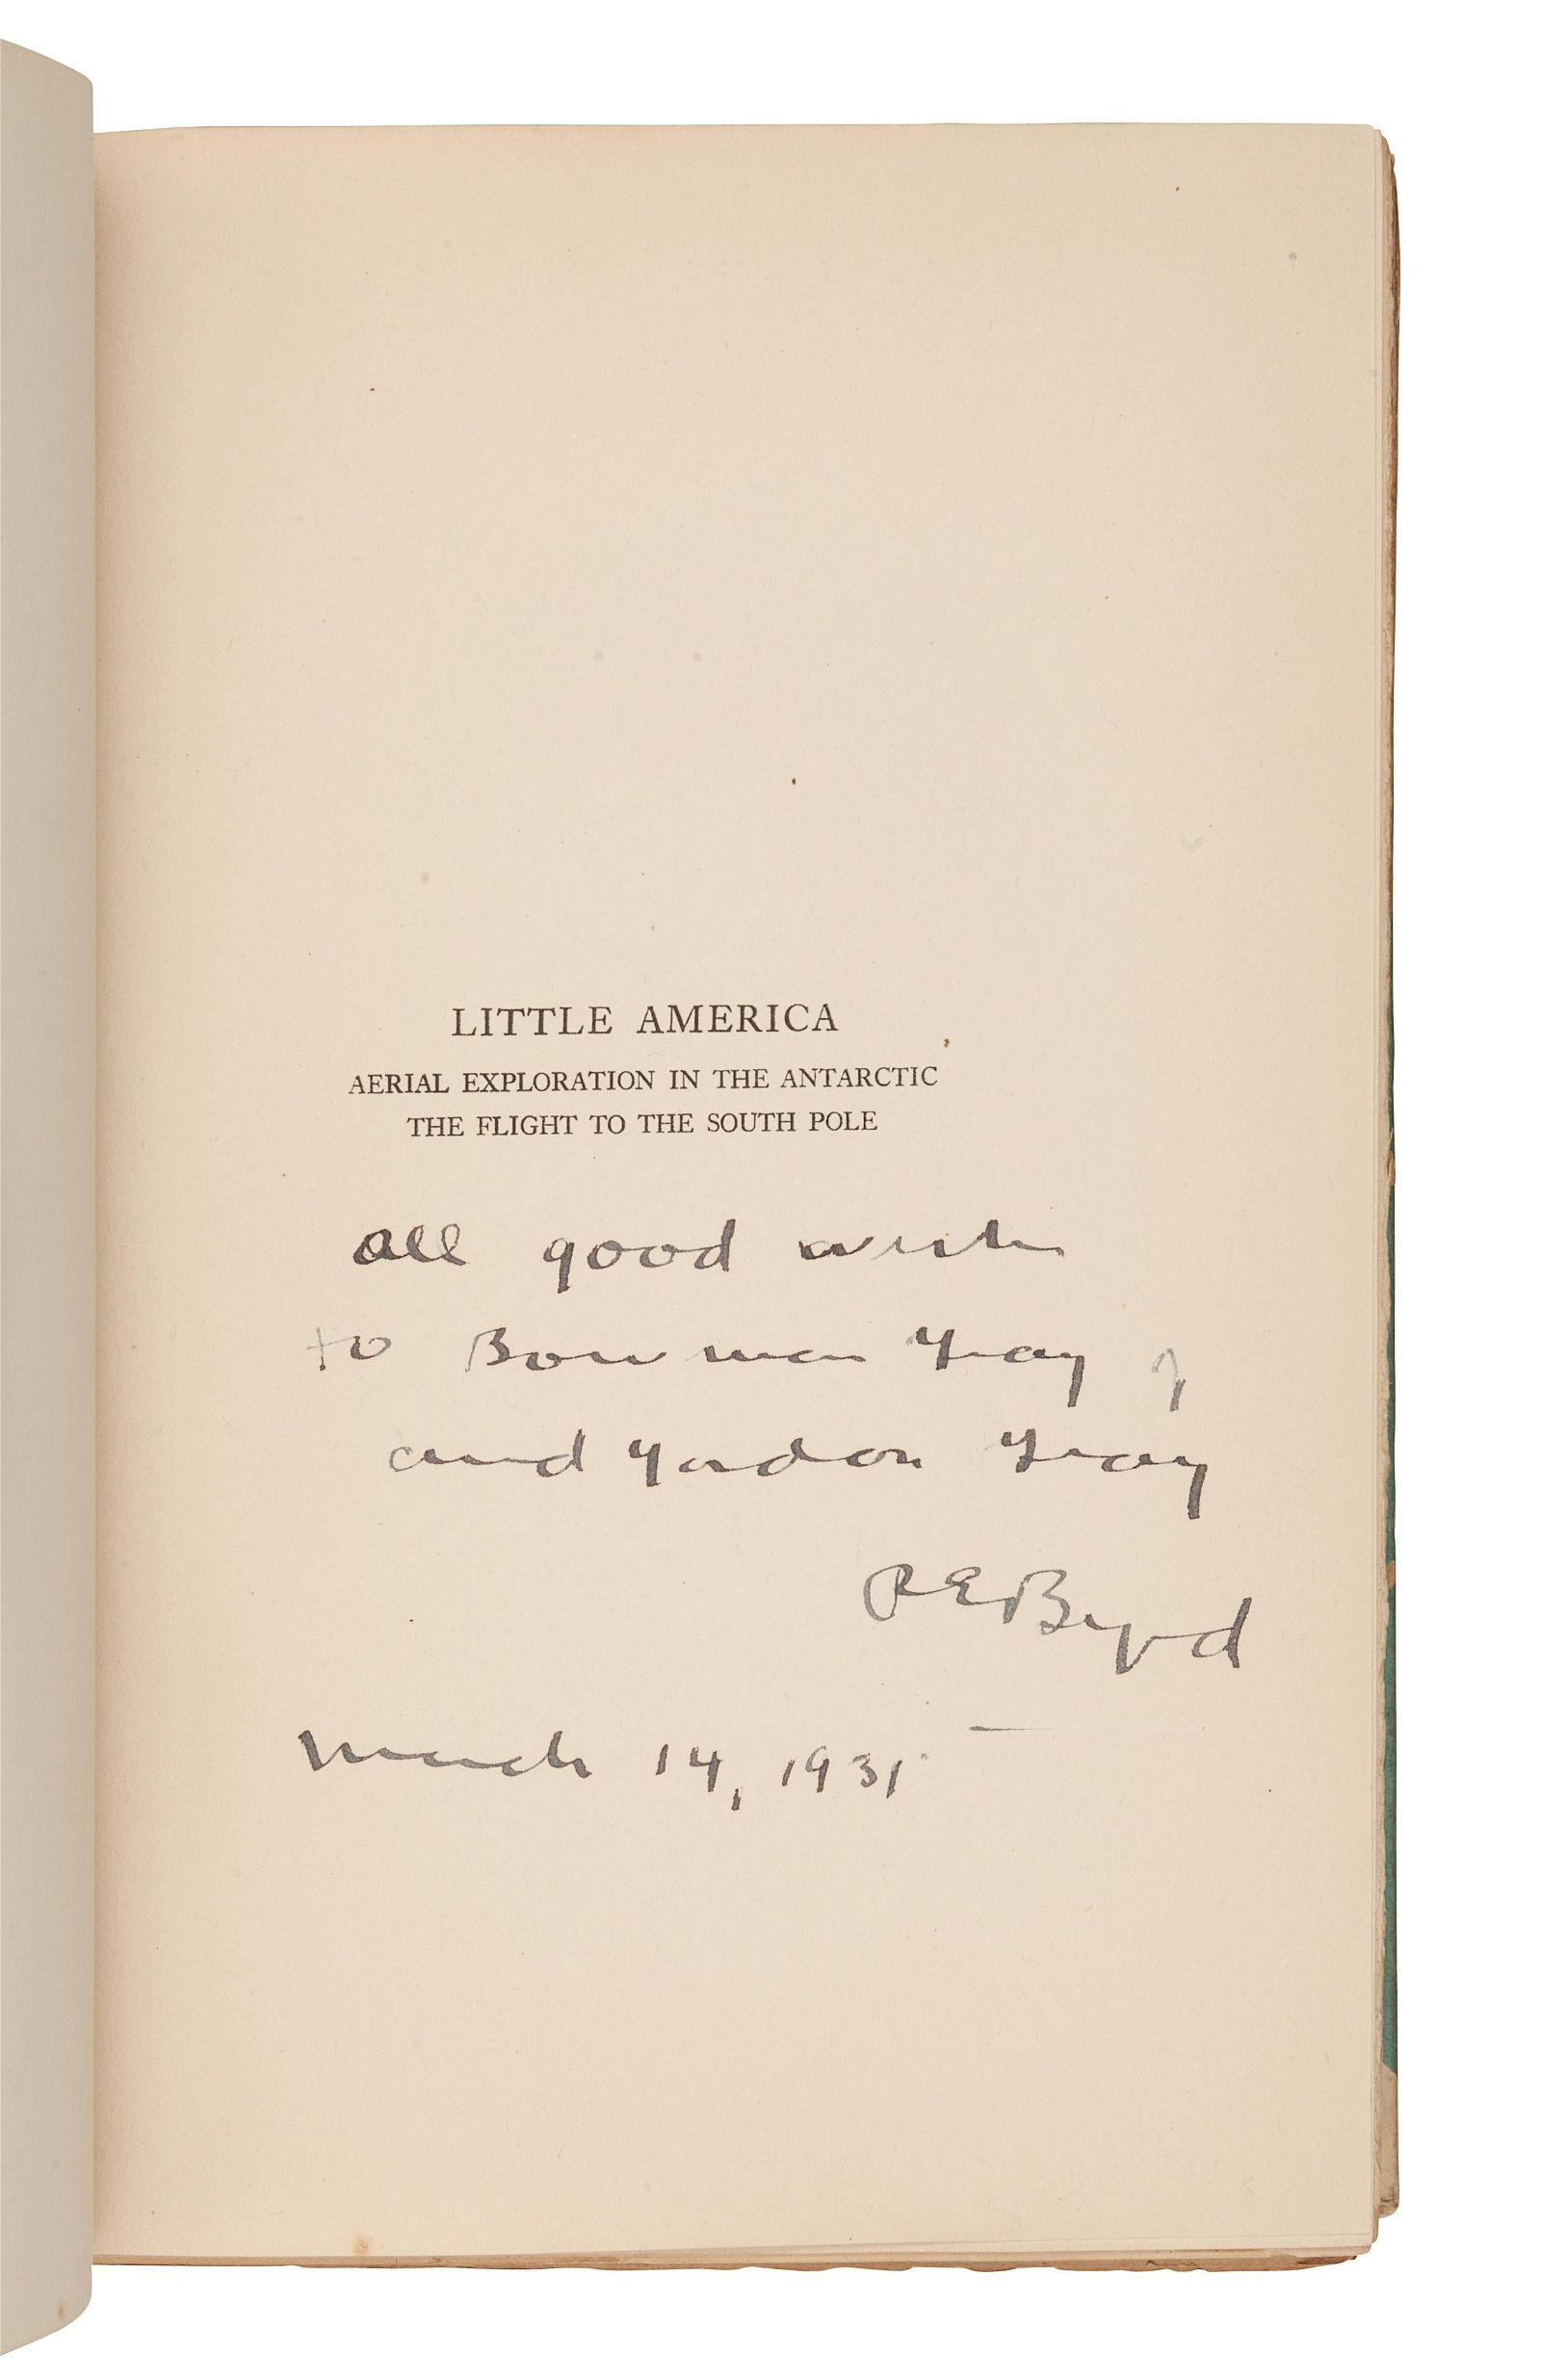 BYRD, Richard Evelyn (1888-1957). Little America. New